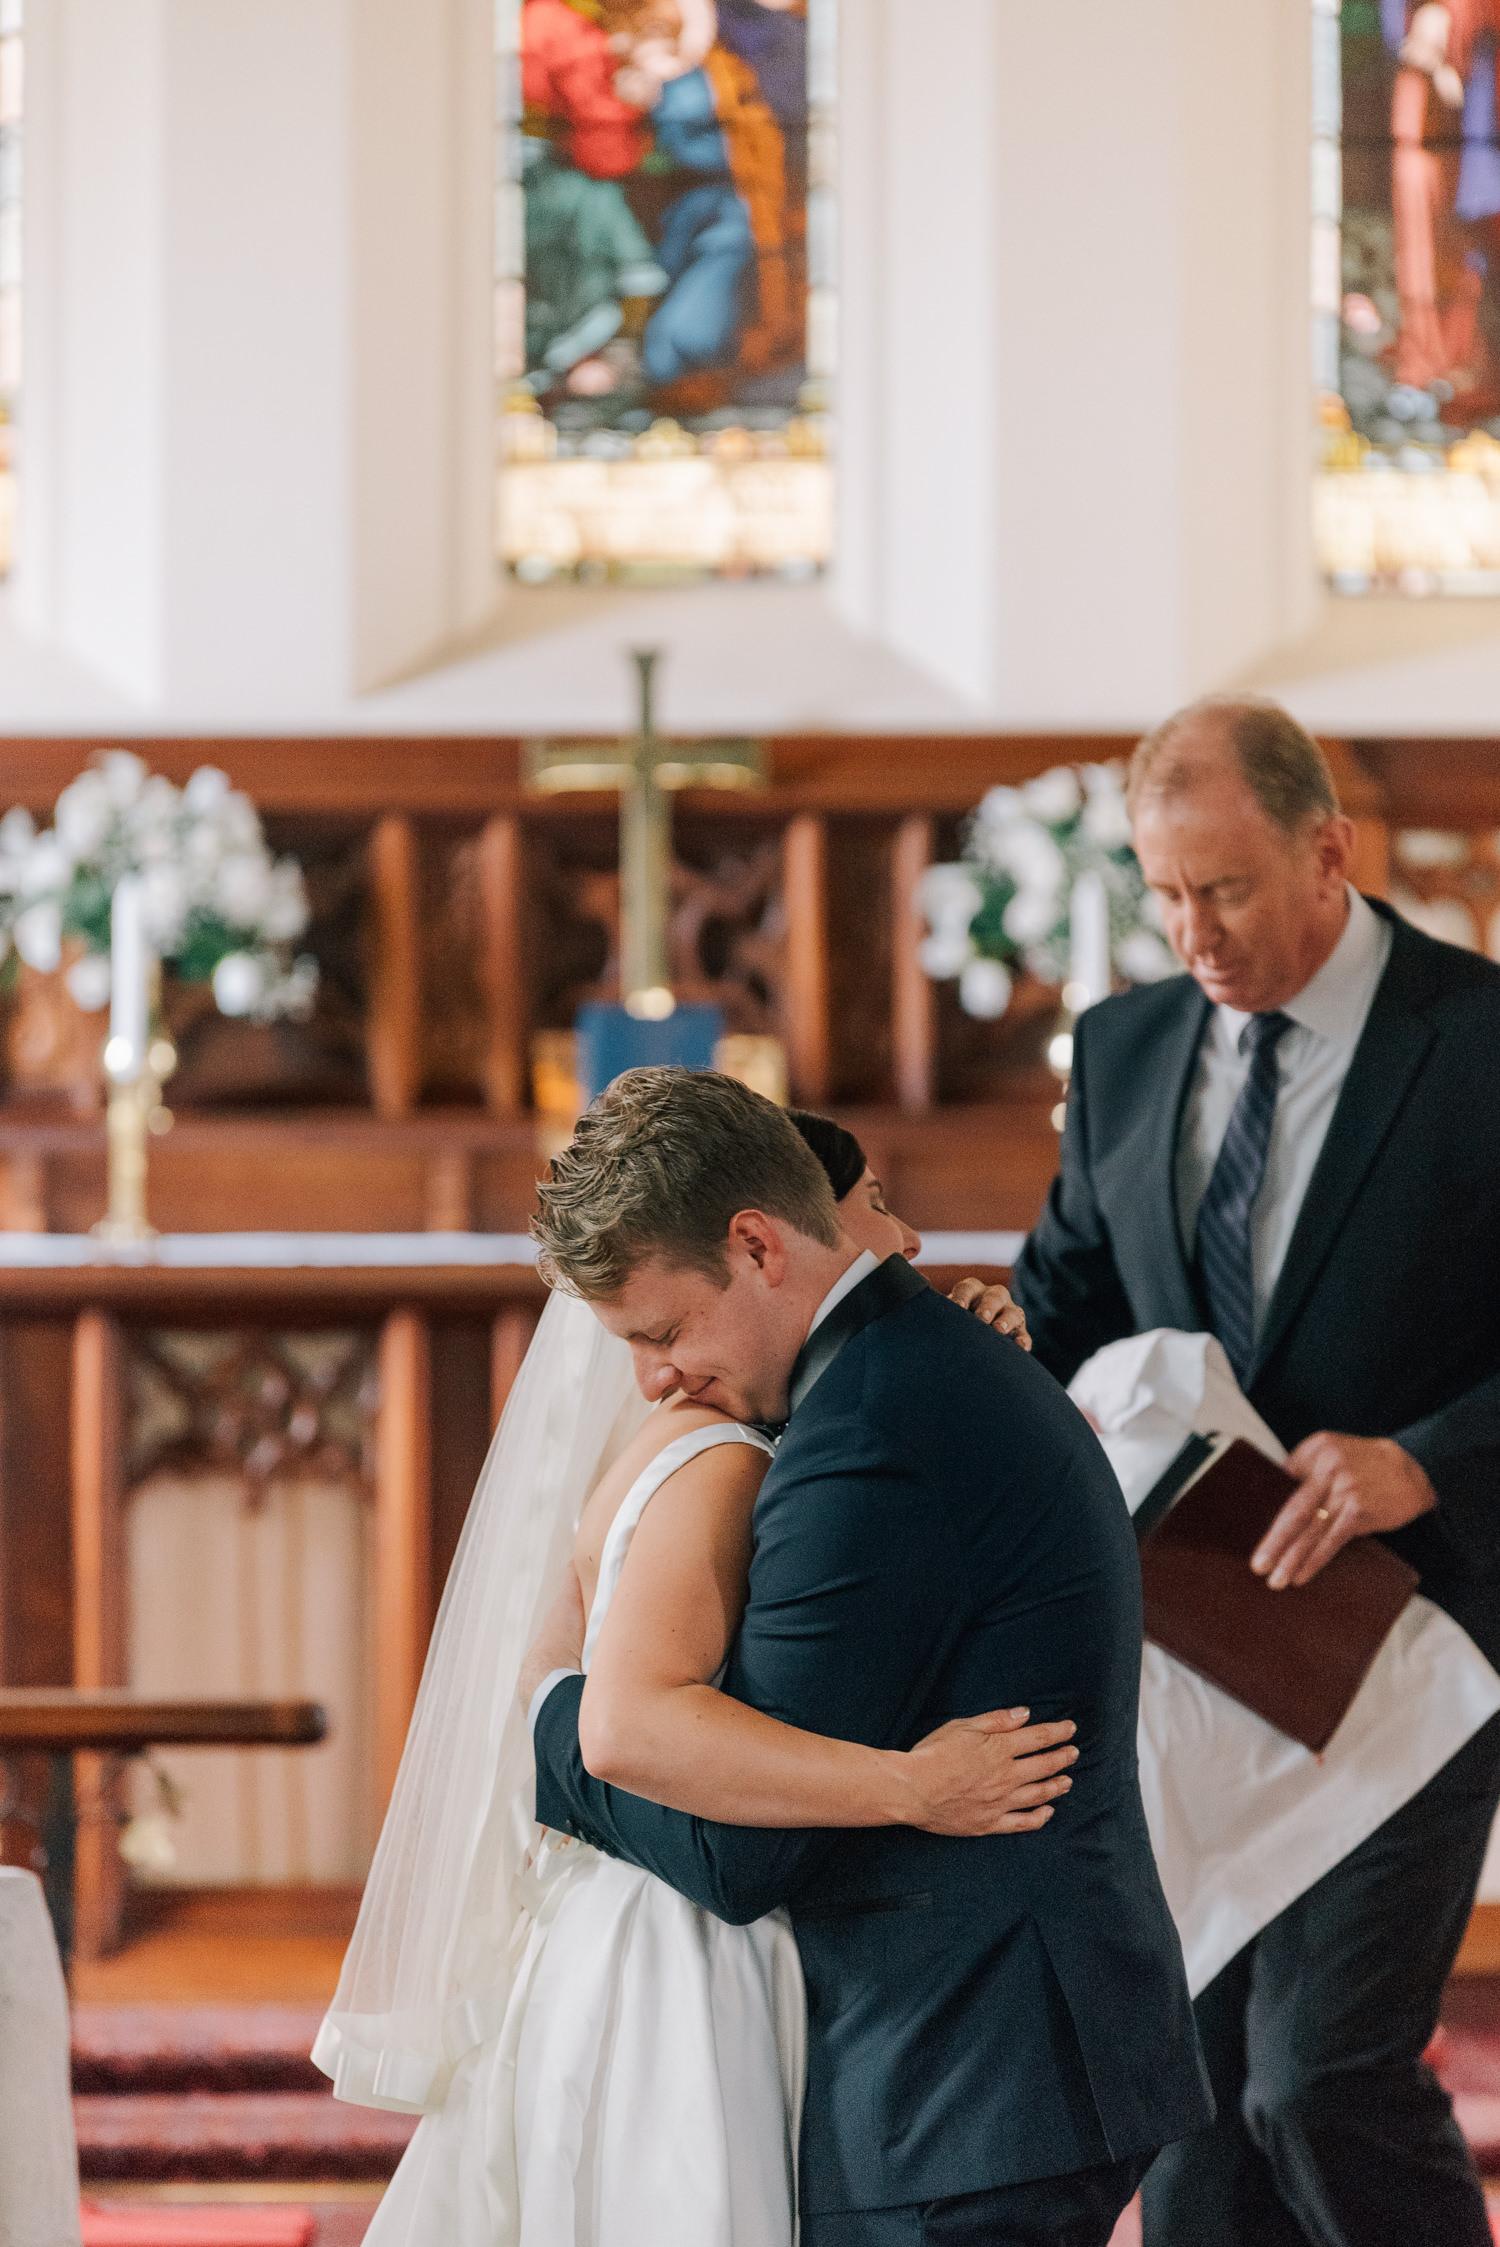 Josef-Chromy-Wedding-Photographer-33.jpg